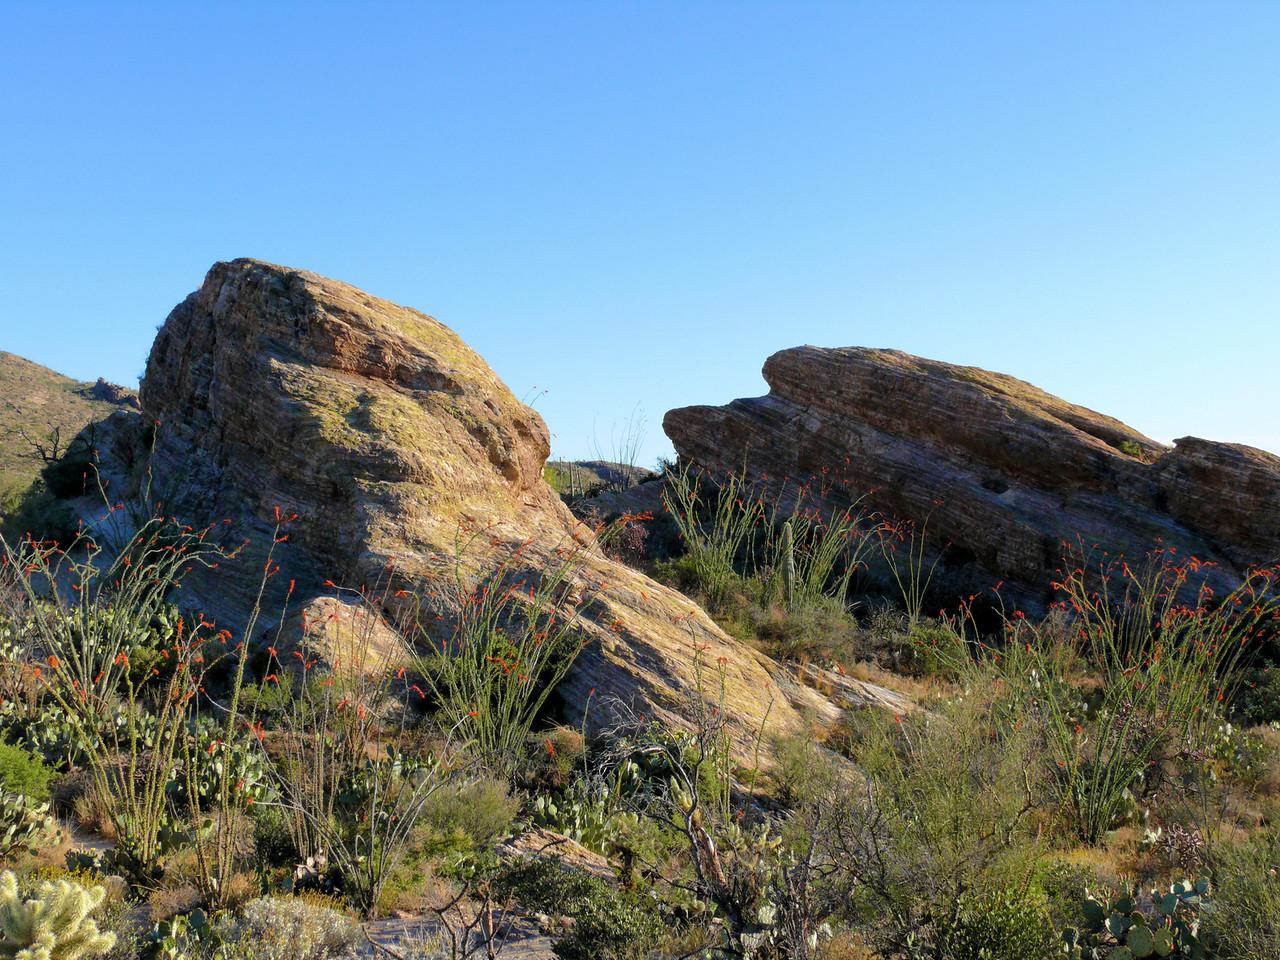 Blooming Ocitillio Rocks